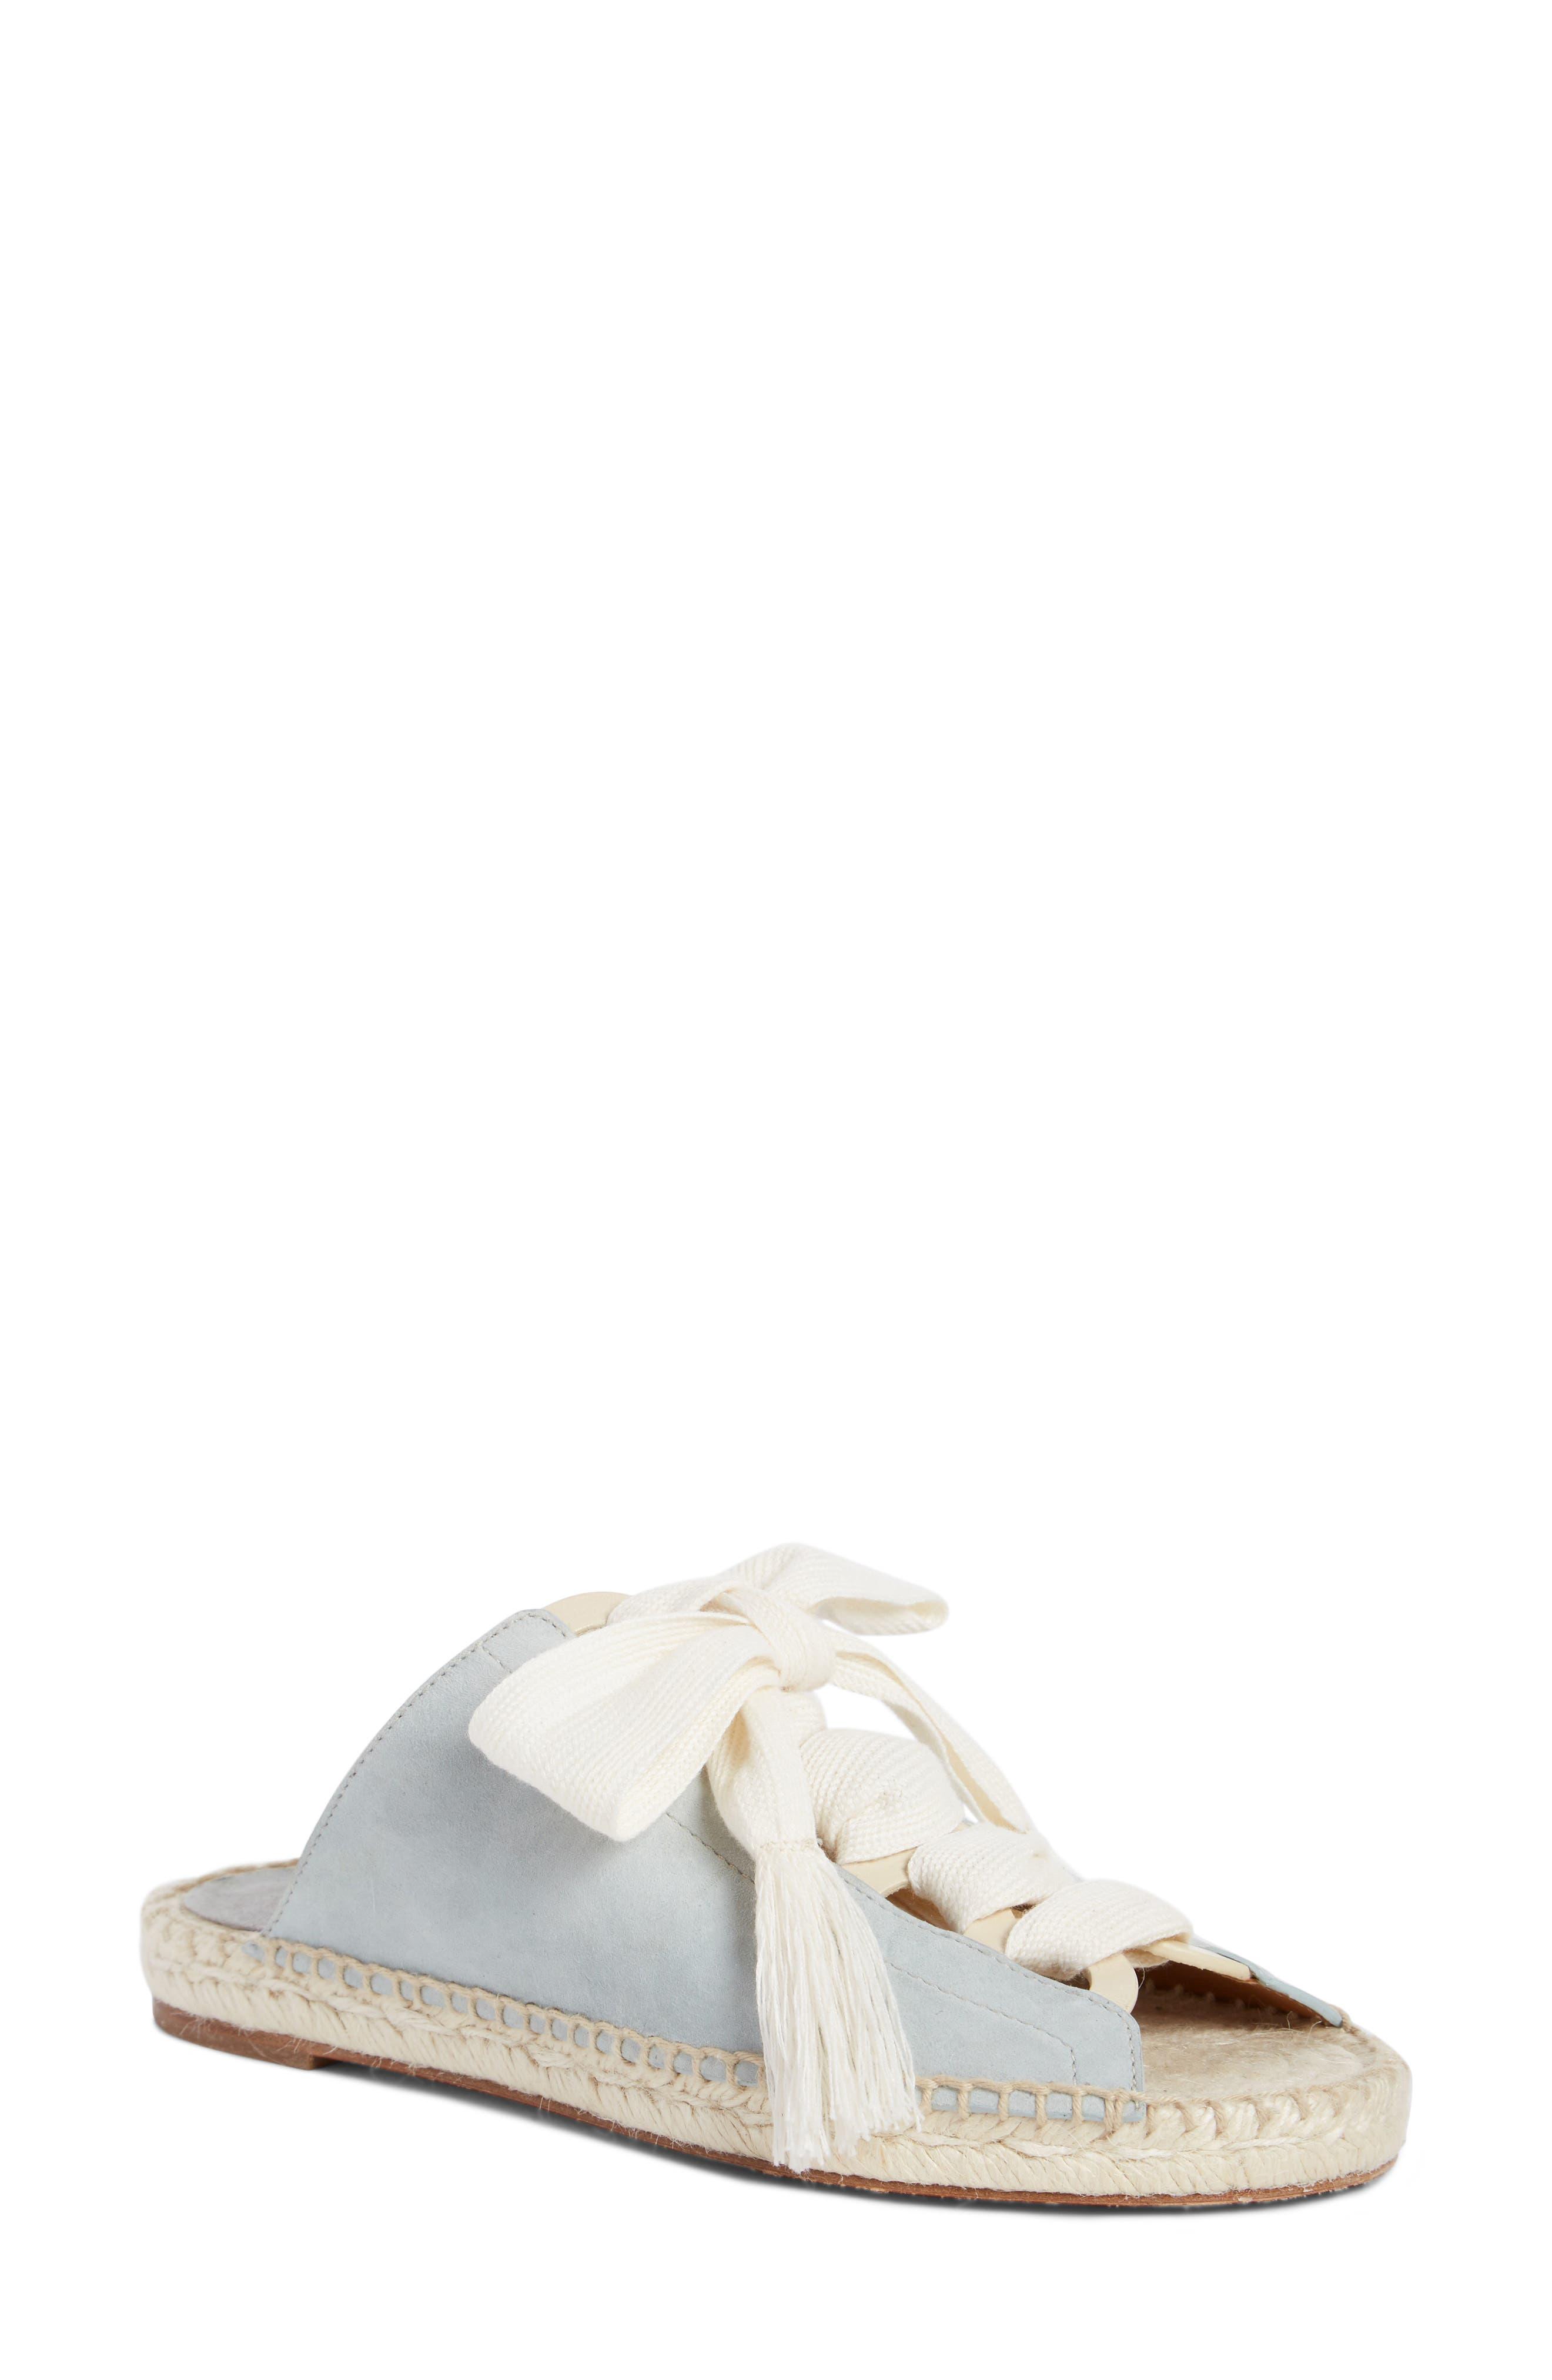 Harper Lace-Up Espadrille Slide Sandal,                             Main thumbnail 1, color,                             450